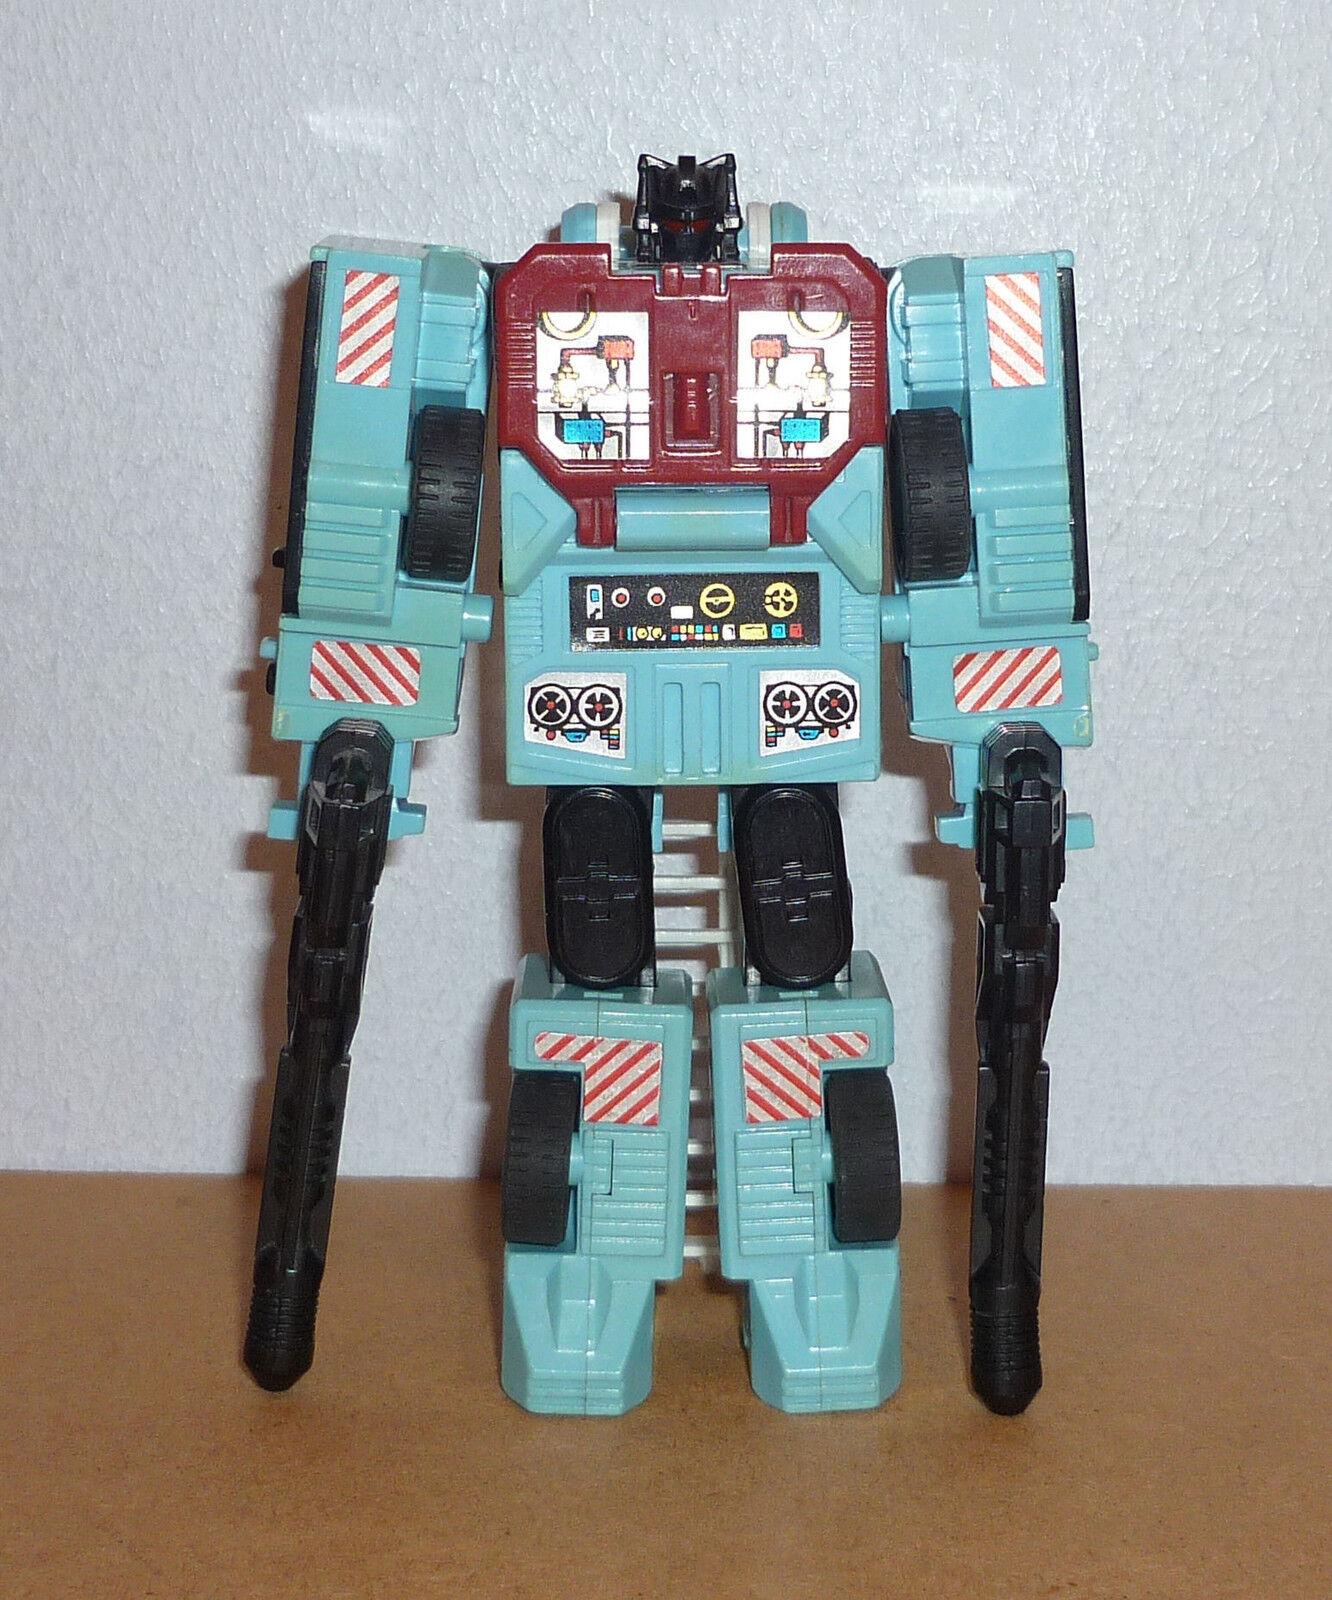 Transformers - G1 Predectobot Hot Spot - 100% Complete